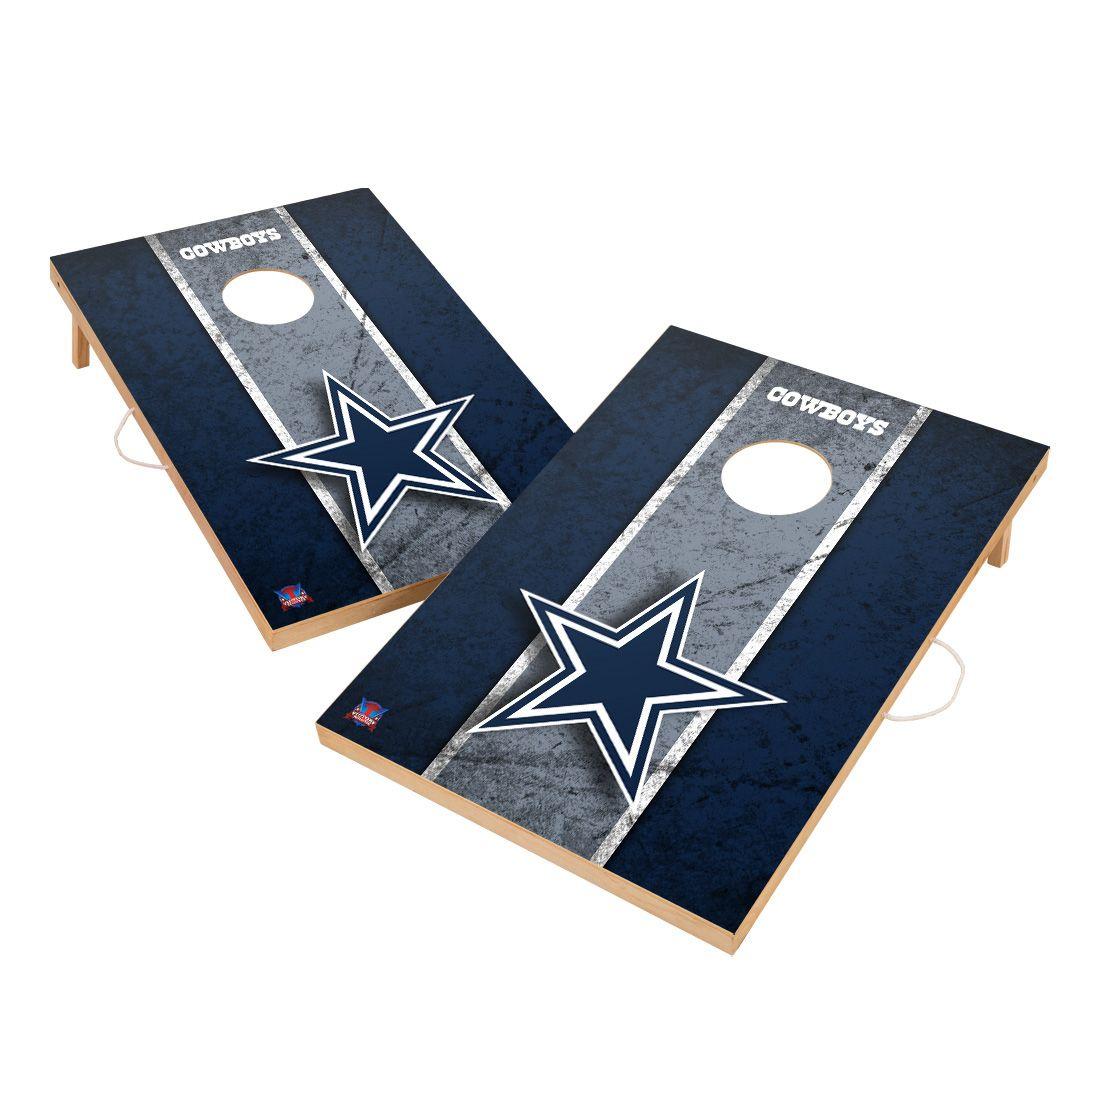 Vintage Dallas Cowboys NFL VT - Solid Wood 2x3 Cornhole